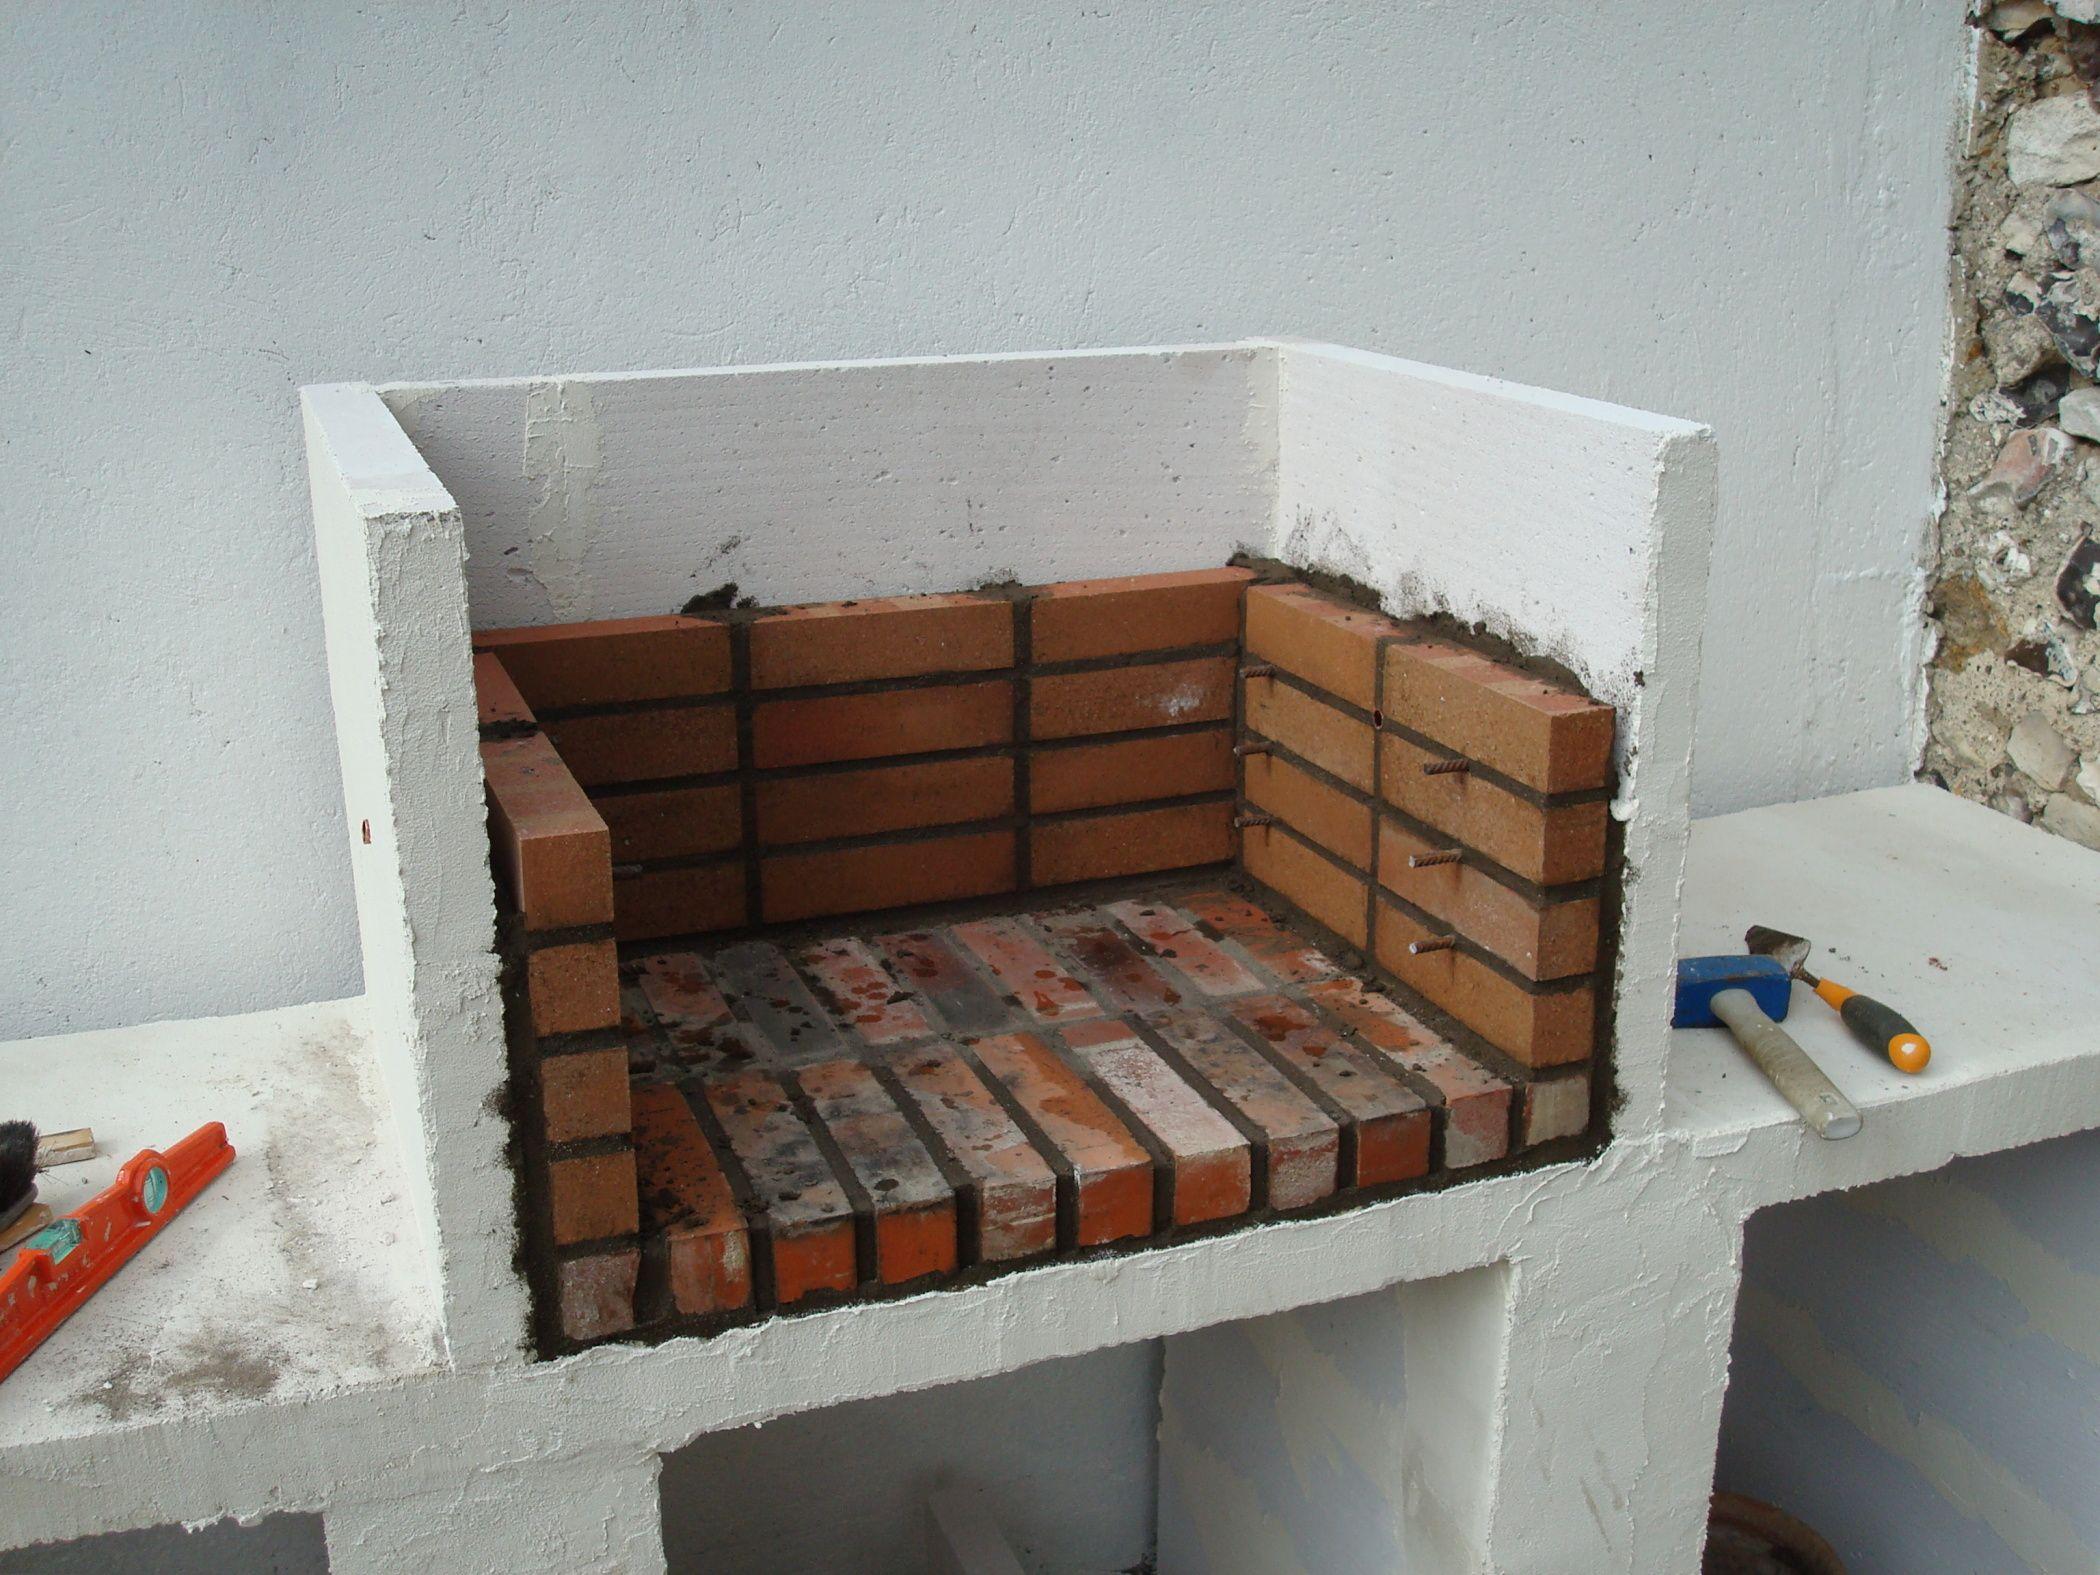 Construction d 39 un barbecue sur mesure barbecue for Construire un foyer exterieur en pierre